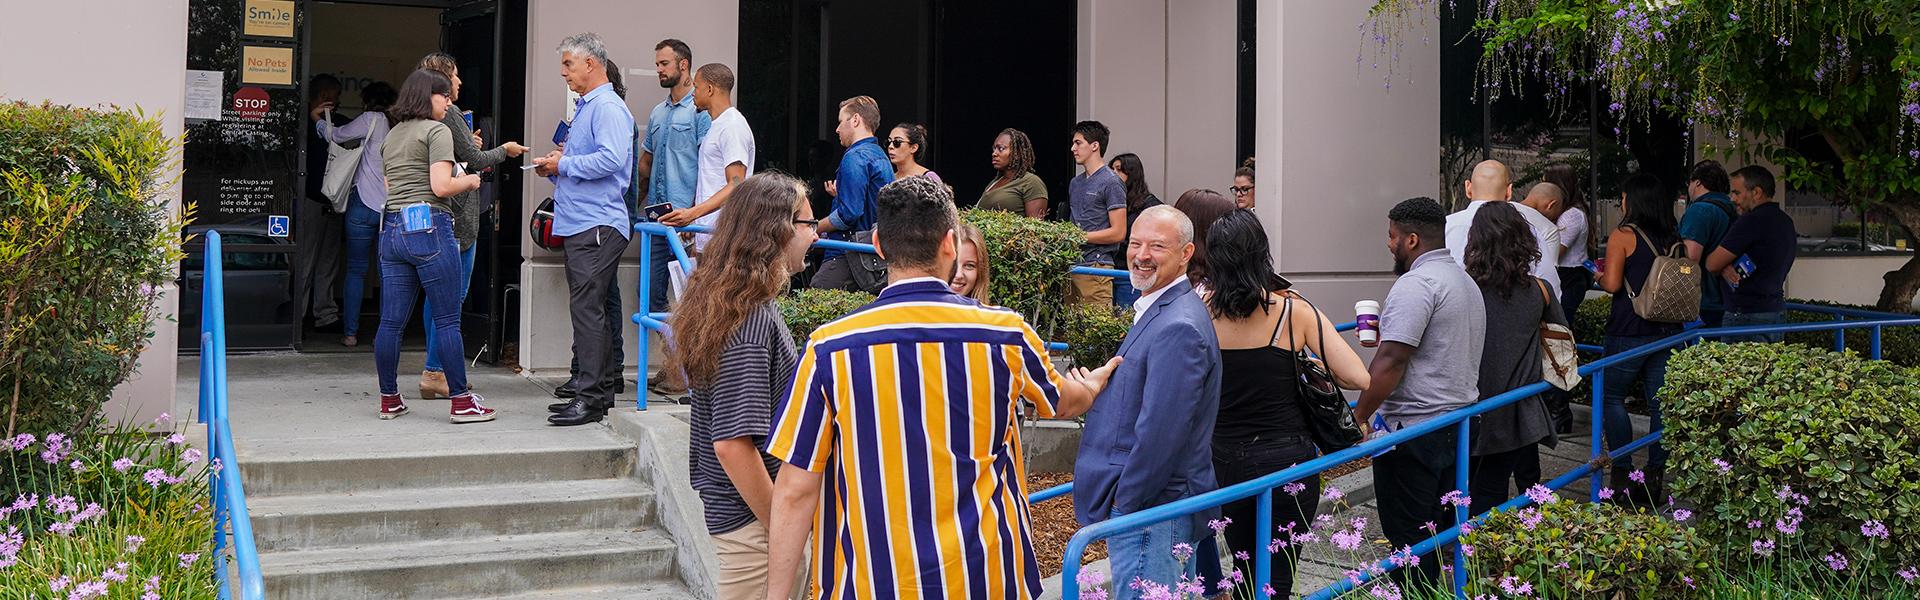 Registration at Central Casting Los Angeles